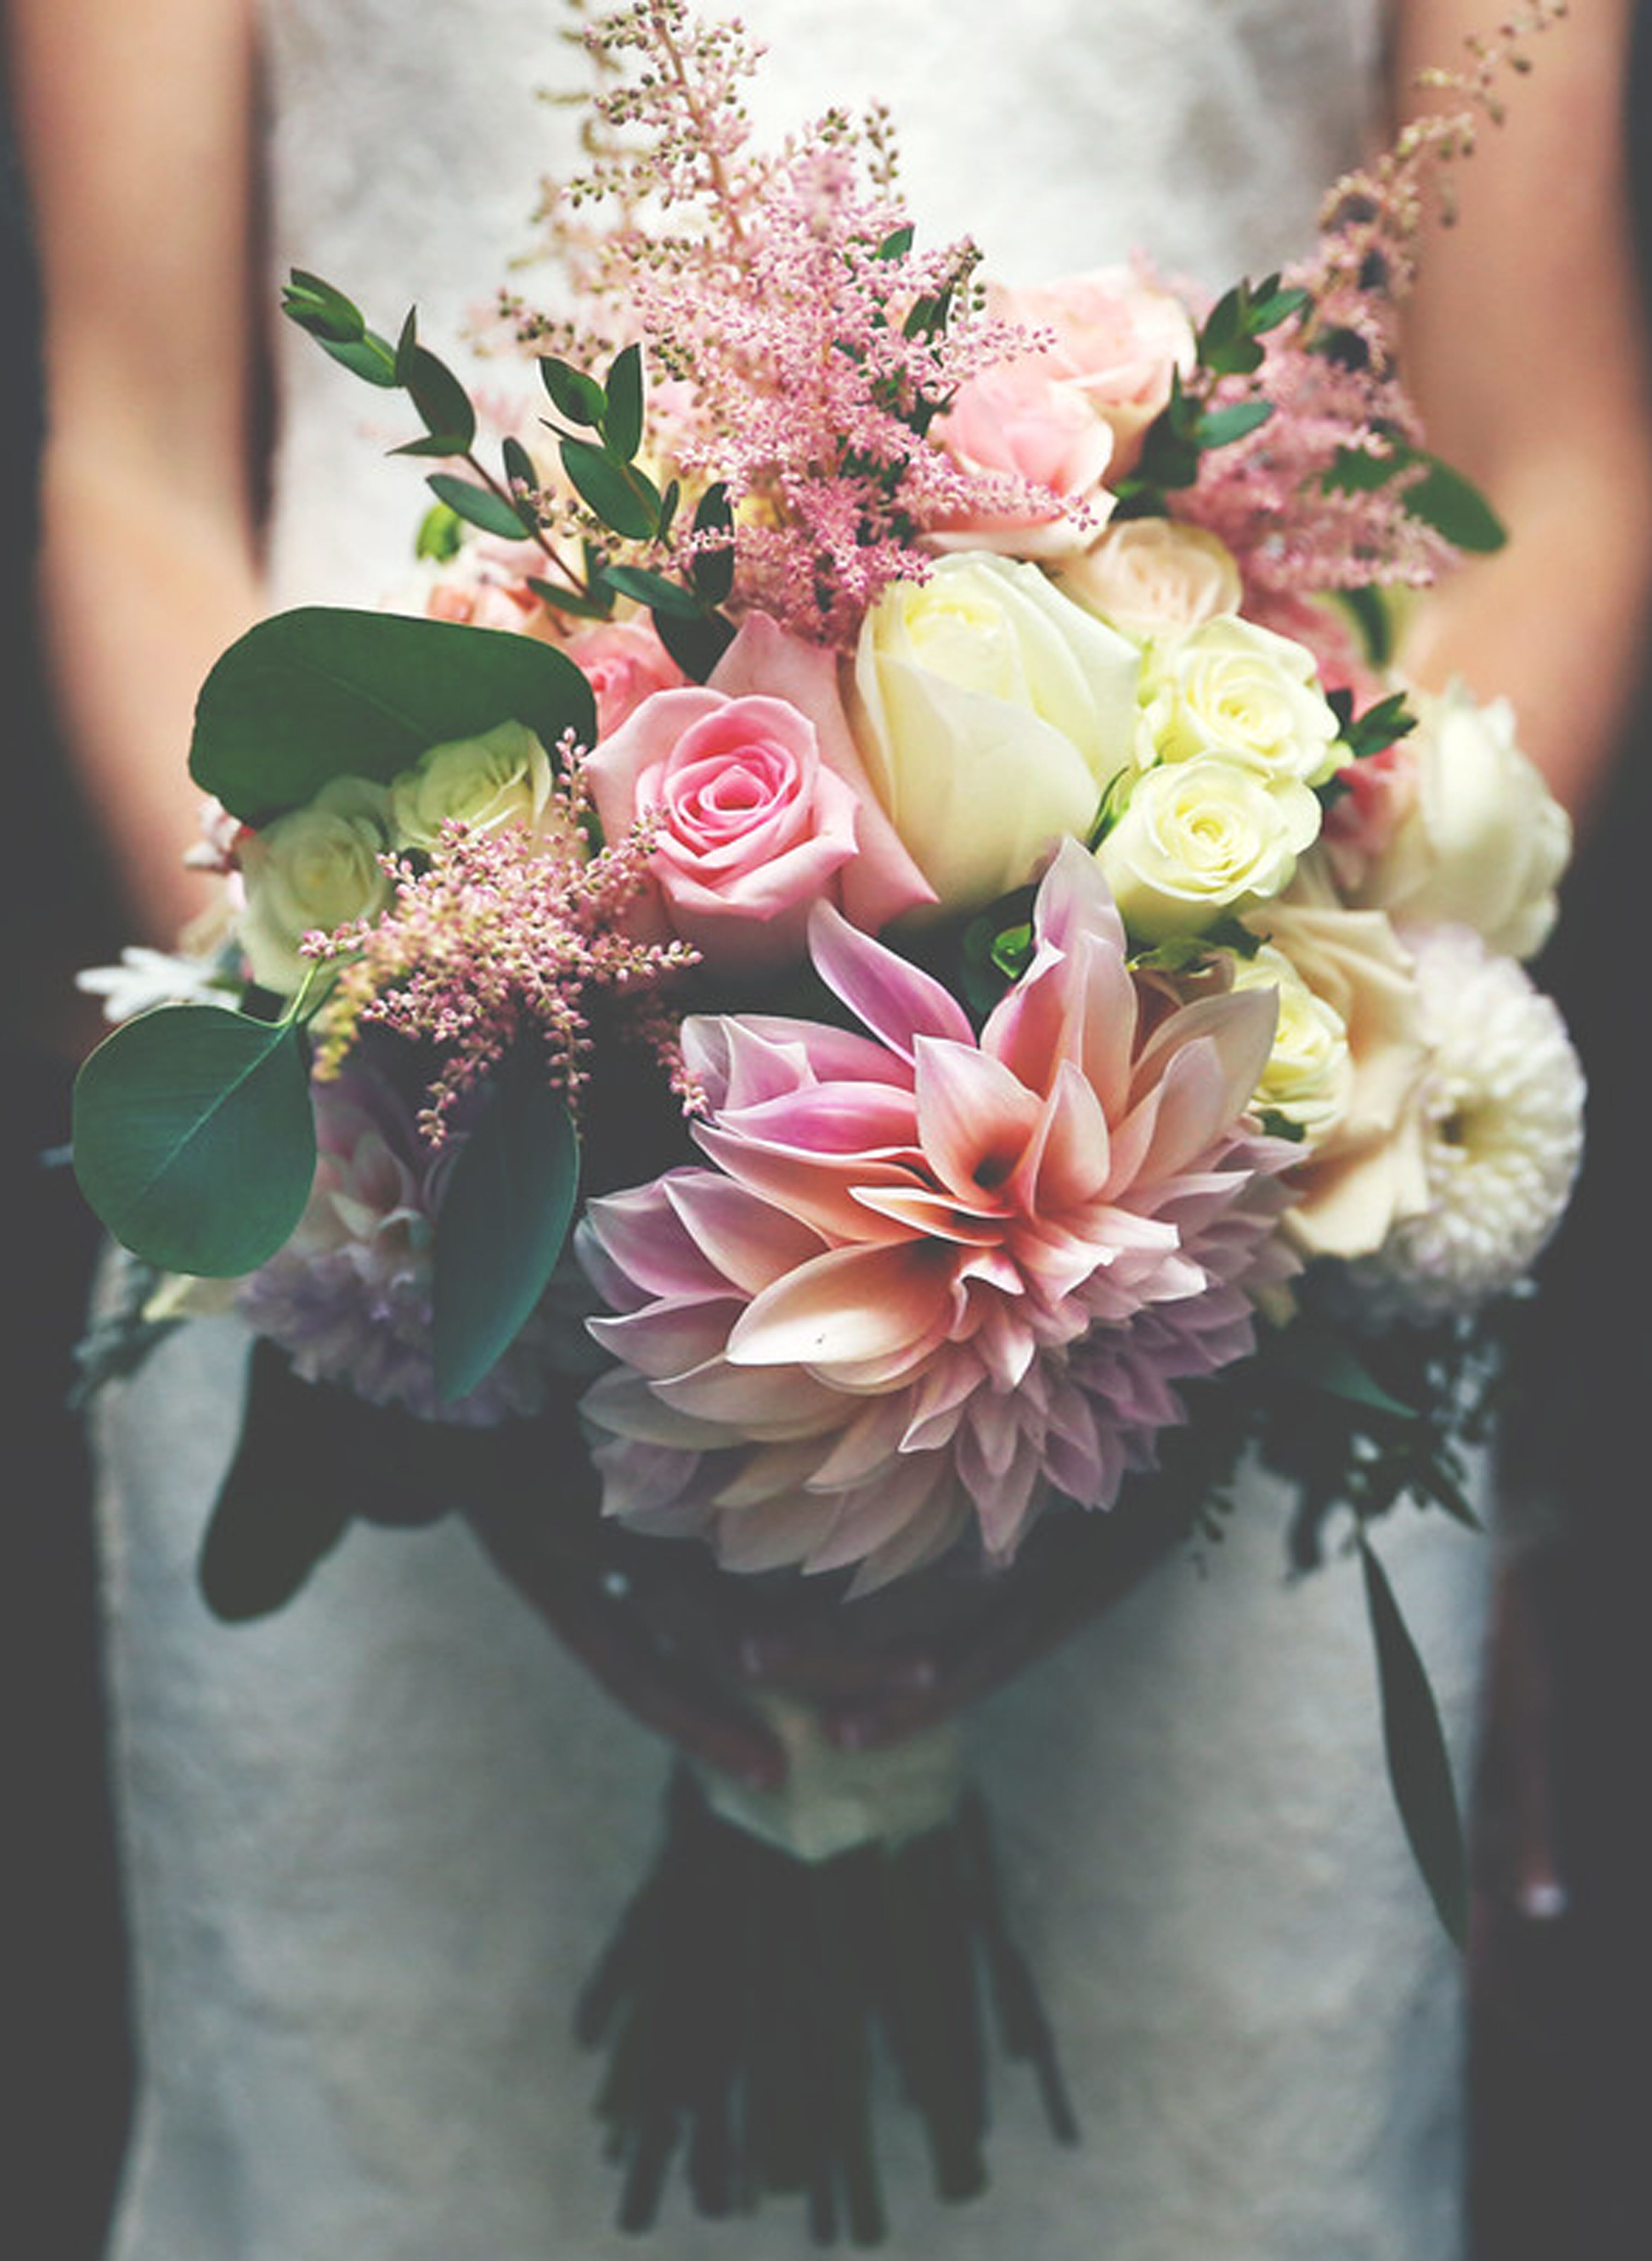 Danielson Flowers Shrewsbury Ma